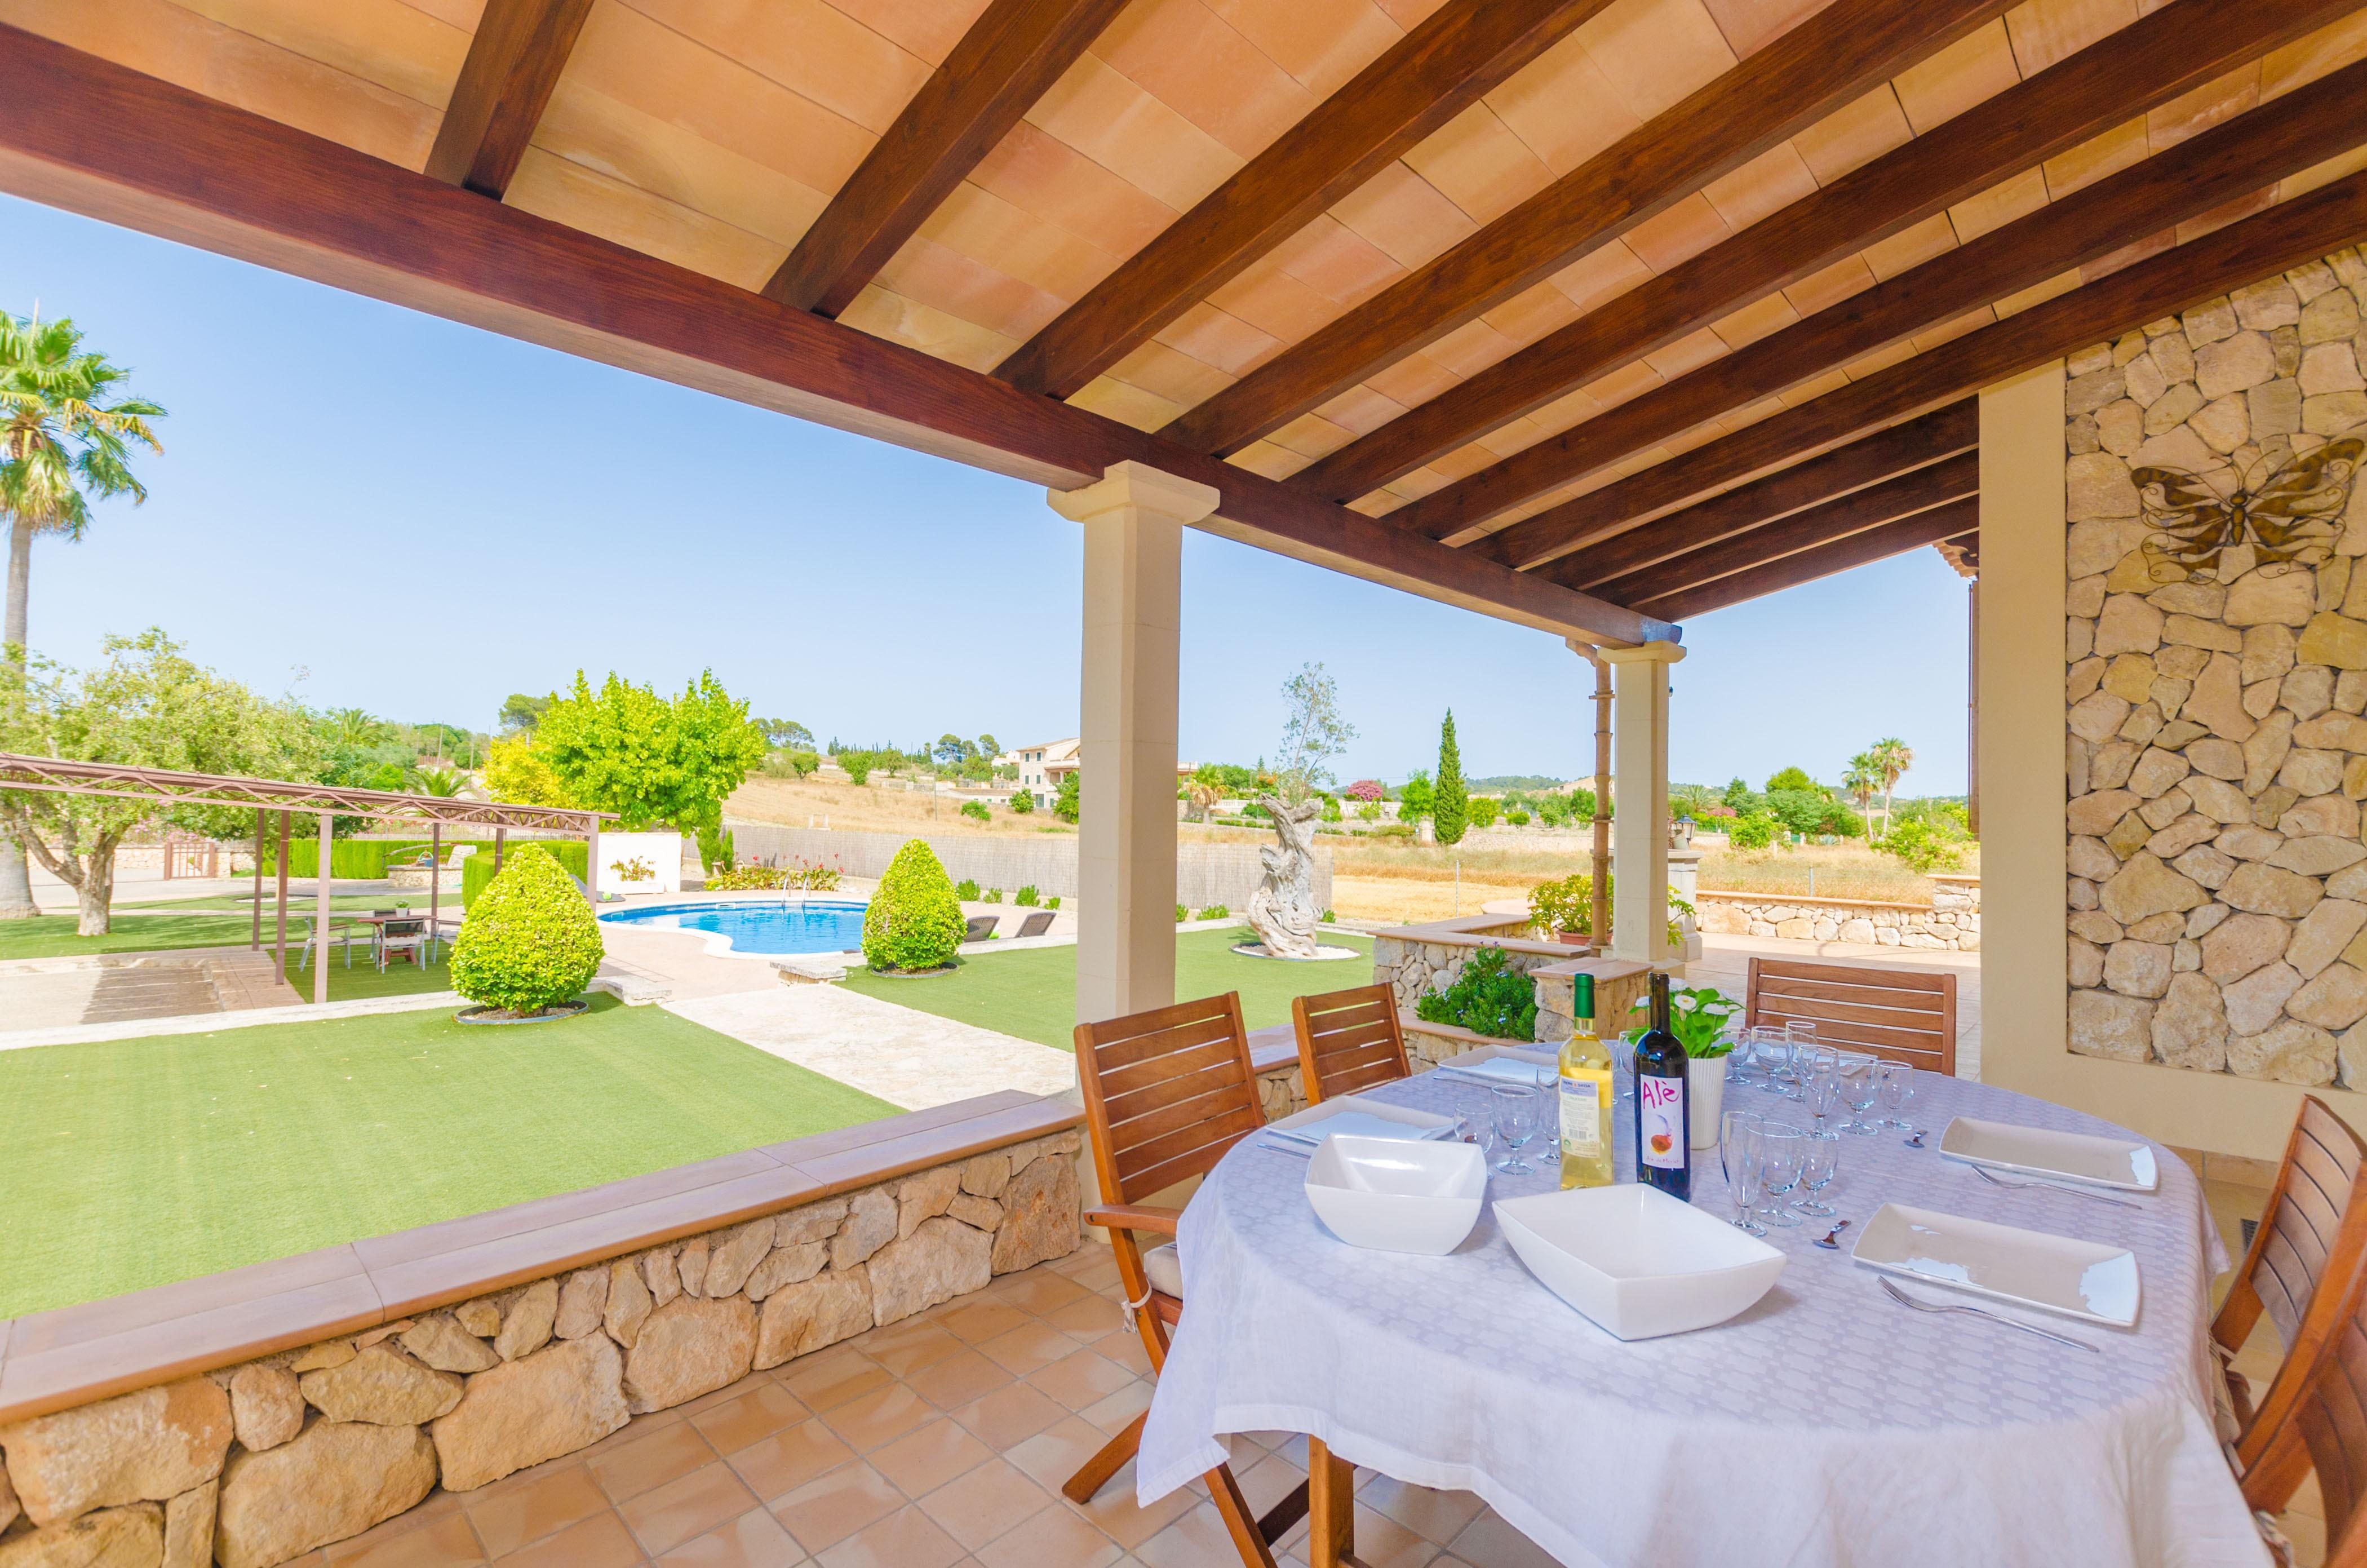 Maison de vacances SA SINIA (2374876), Lloret de Vistalegre, Majorque, Iles Baléares, Espagne, image 13